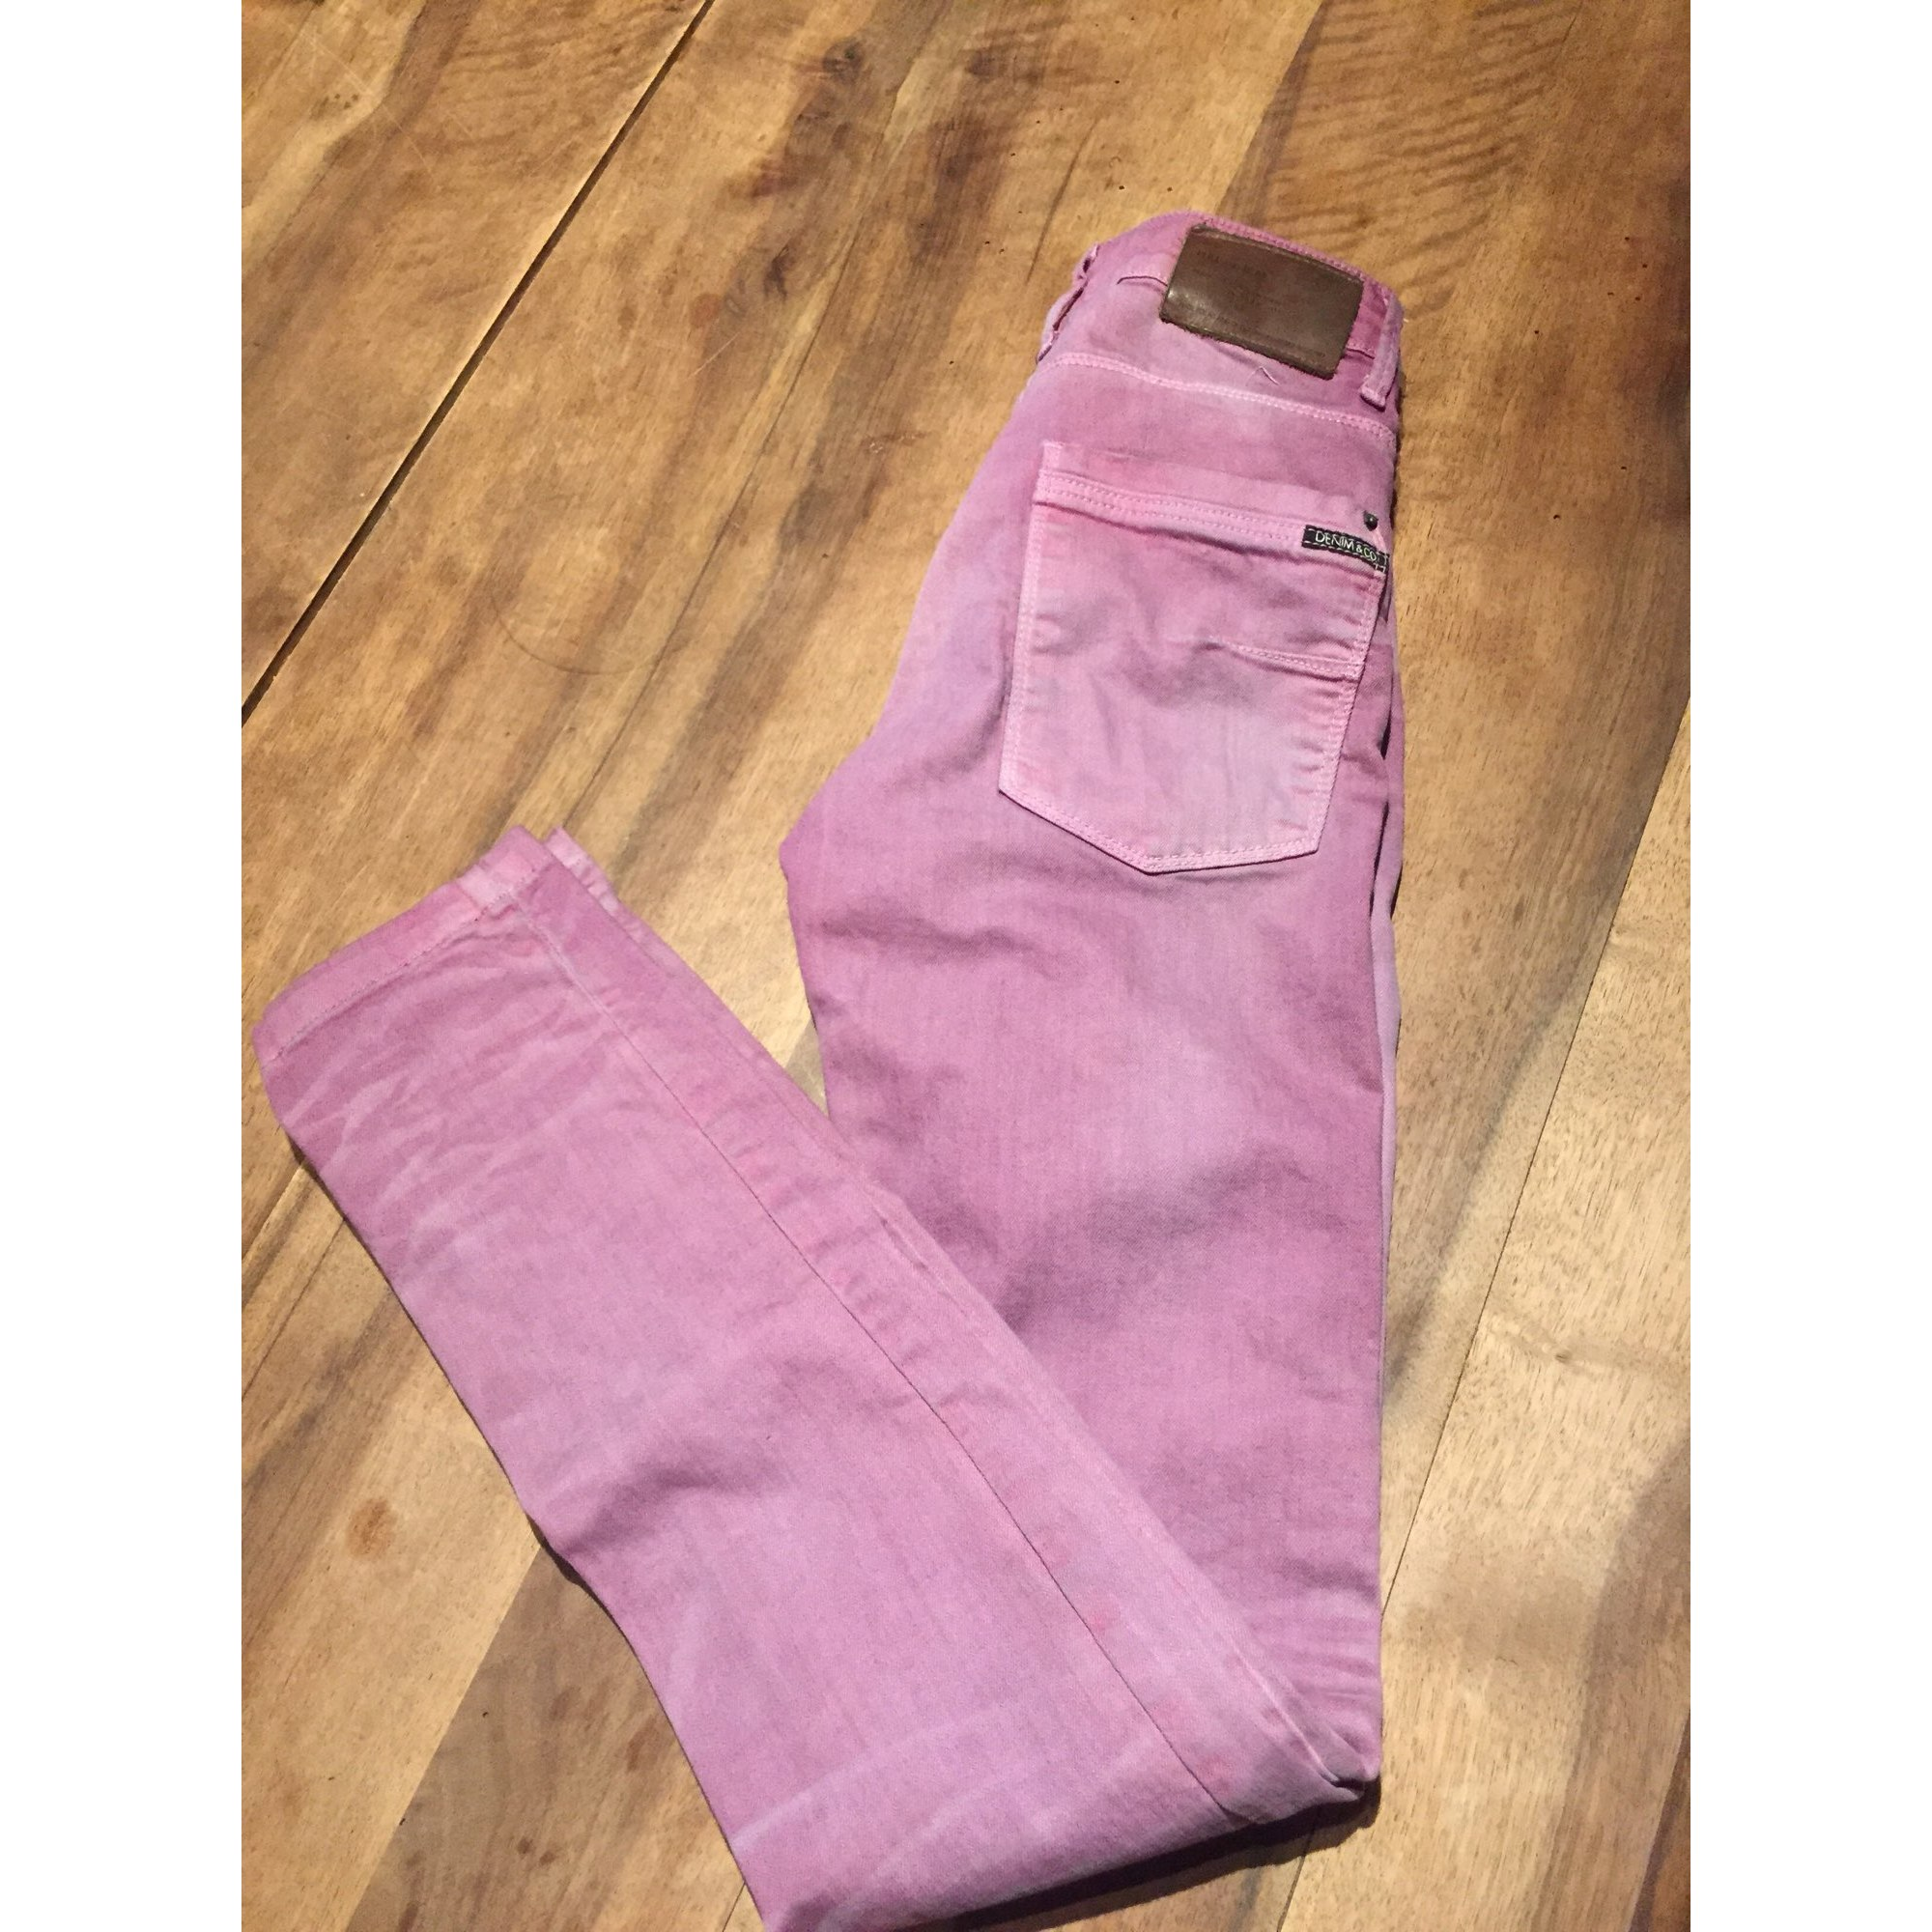 Straight Leg Pants PULL & BEAR Pink, fuchsia, light pink